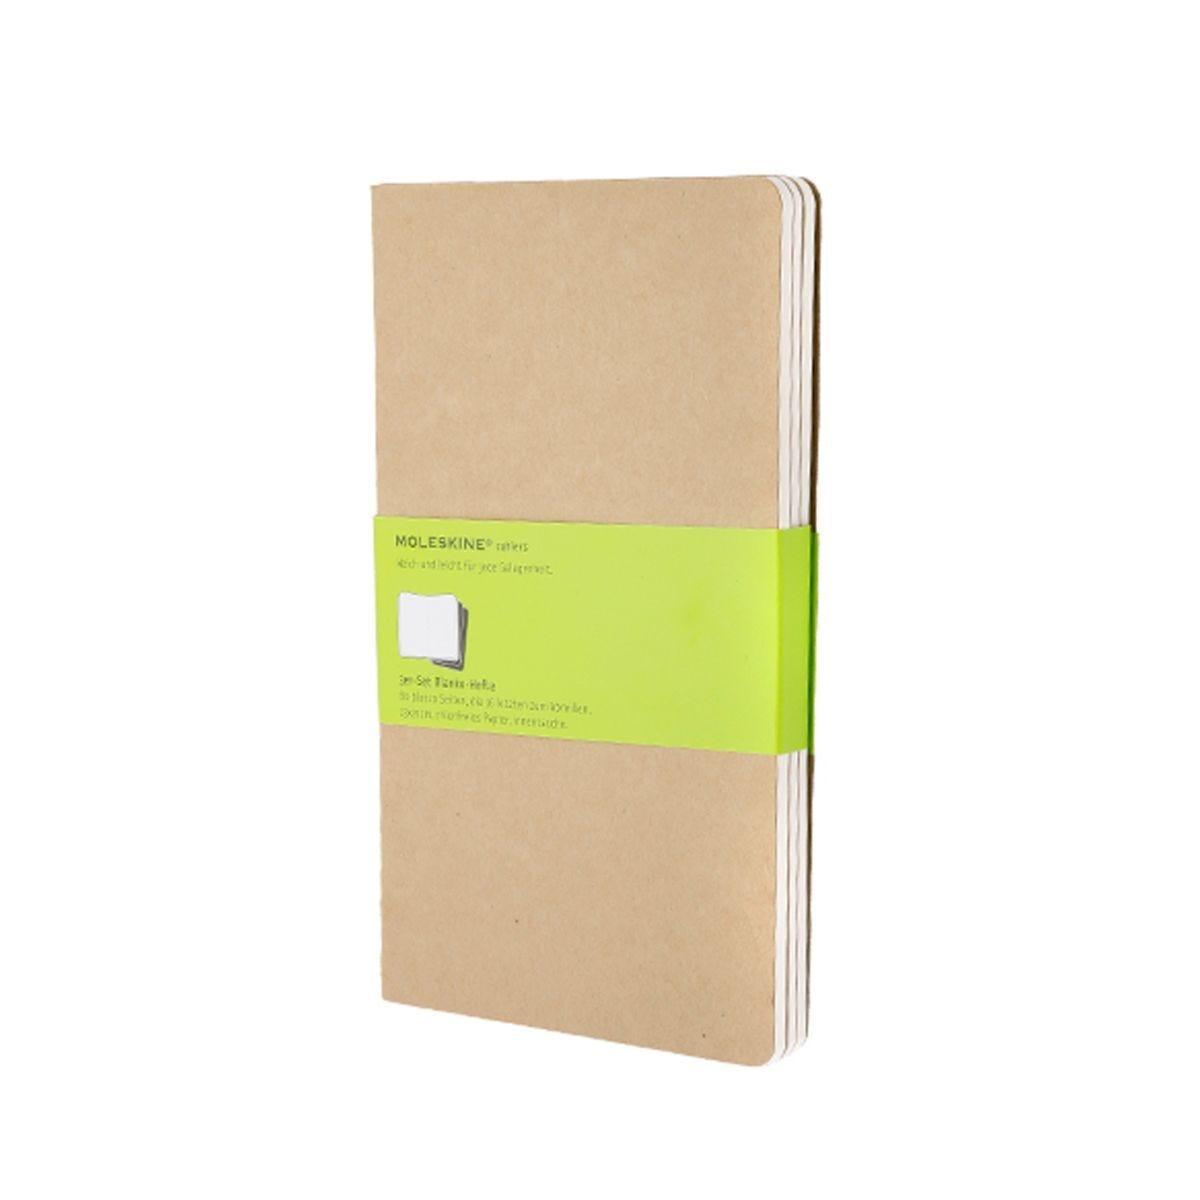 Moleskine Cahier Large Plain Journals Kraft